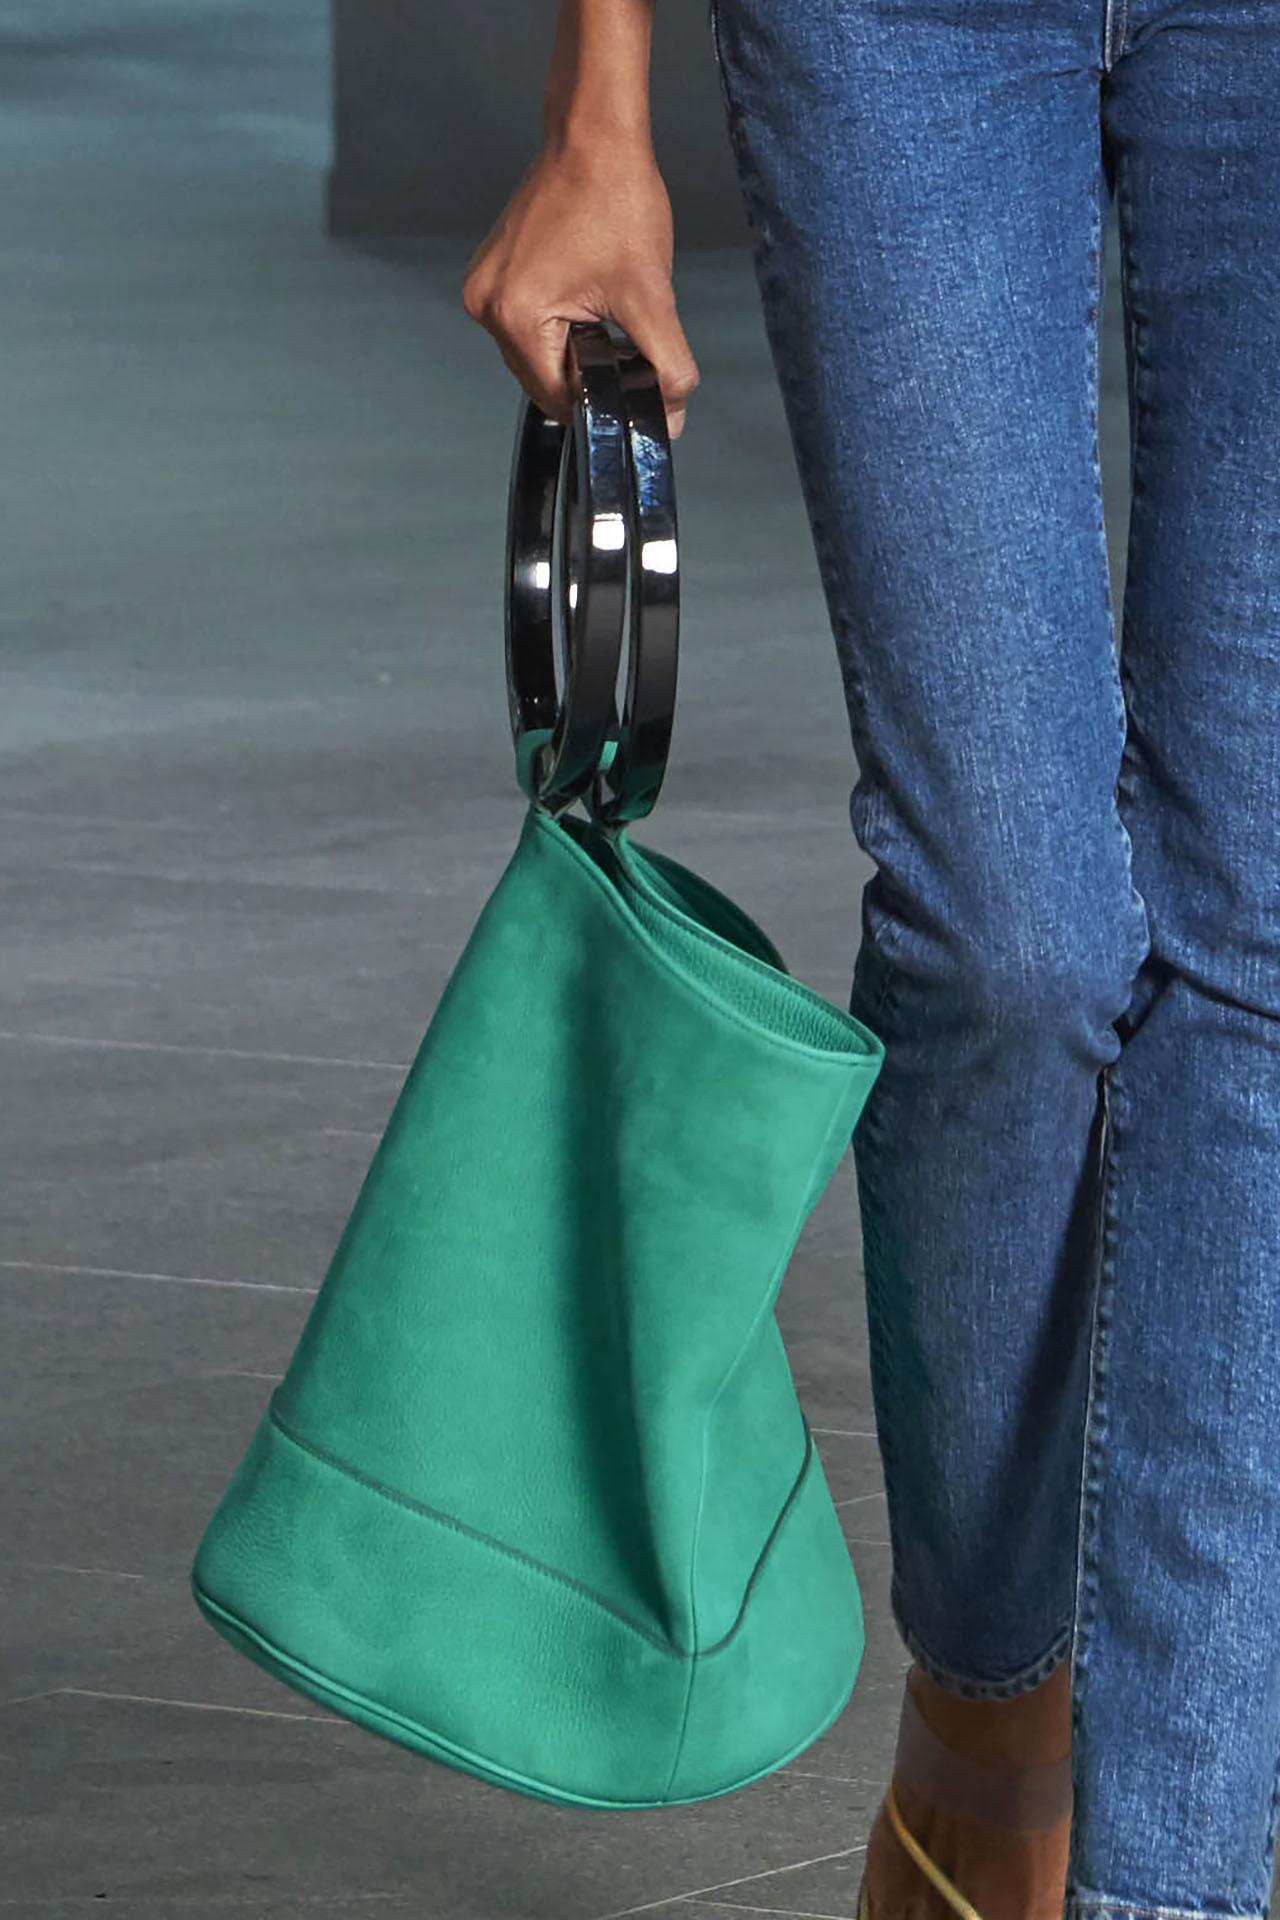 new-york-fashion-week-bags-spring-2018-simon-miller-teal-handbag.jpg